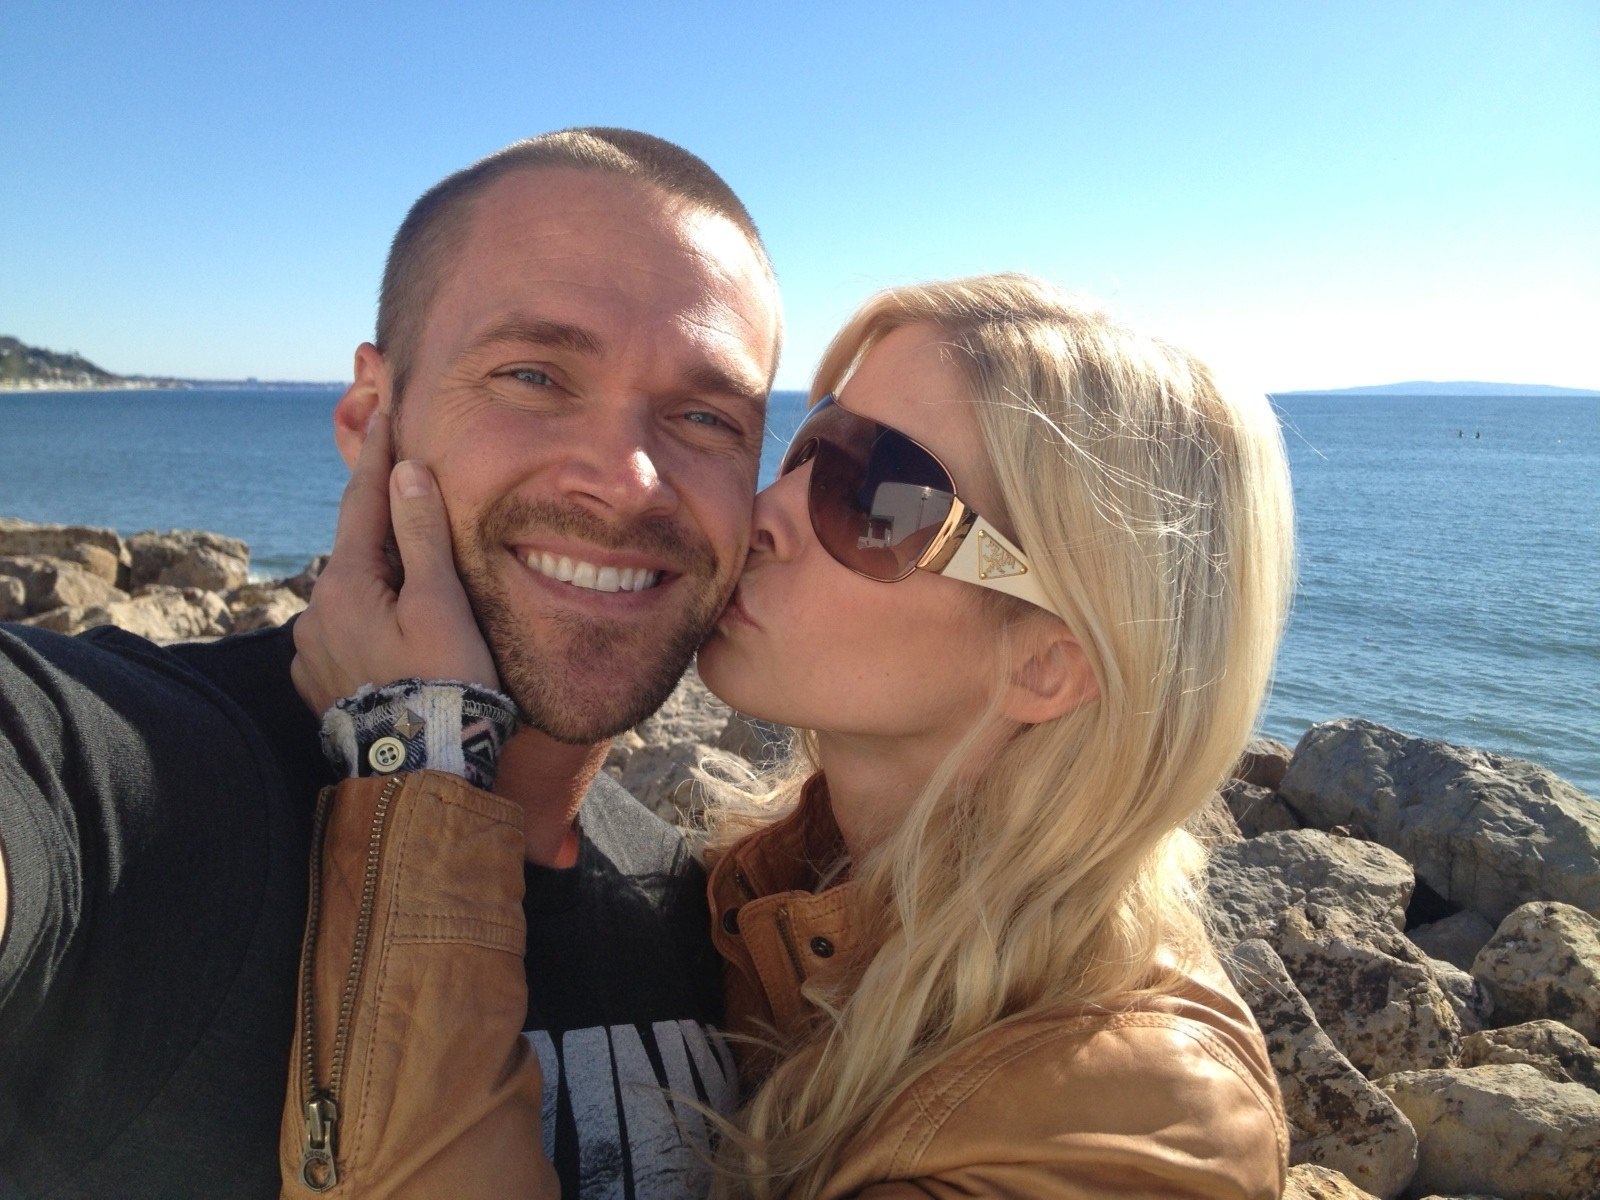 #HeidiPowell and #ChrisPowell #bestfriend break at the beach https://heidipowell.net/198